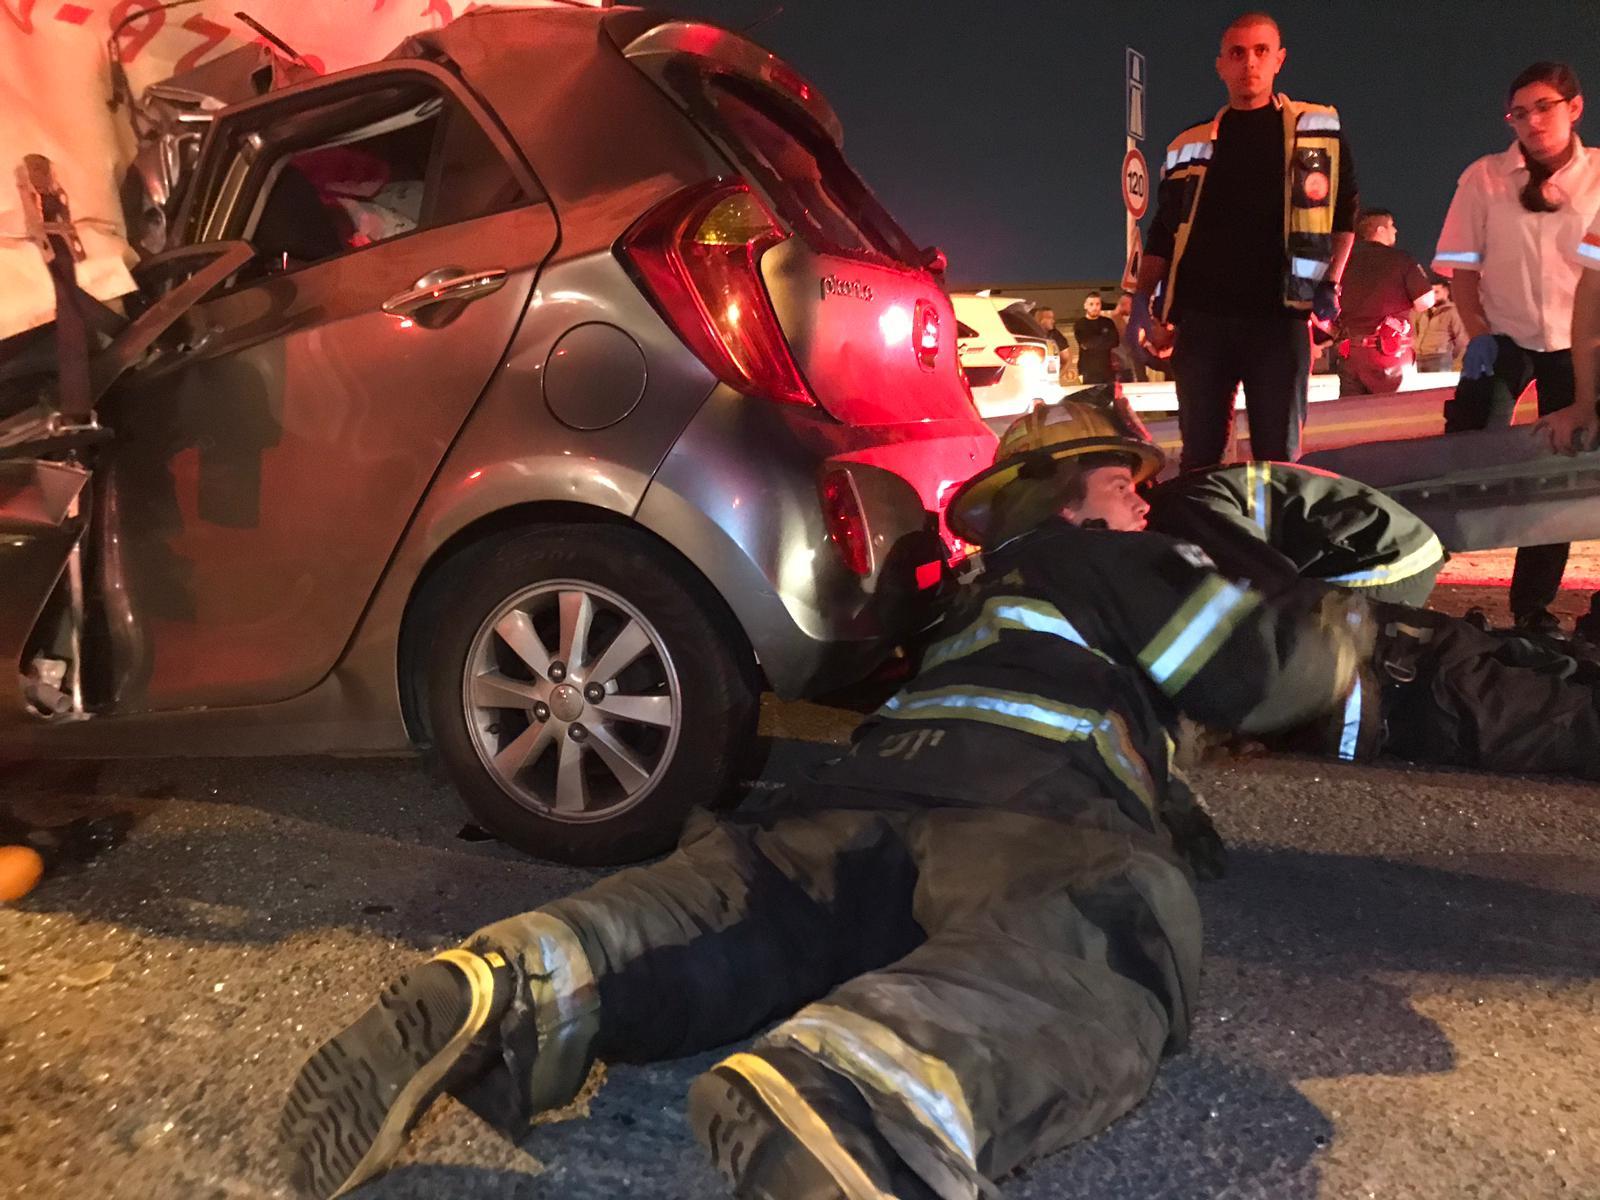 Photo of צפו: תאונה קטלנית מזעזעת ליד מחלף קאסם: שני נוסעים נלכדו עם רכבם מתחת למשאית. מותם נקבע בזירה